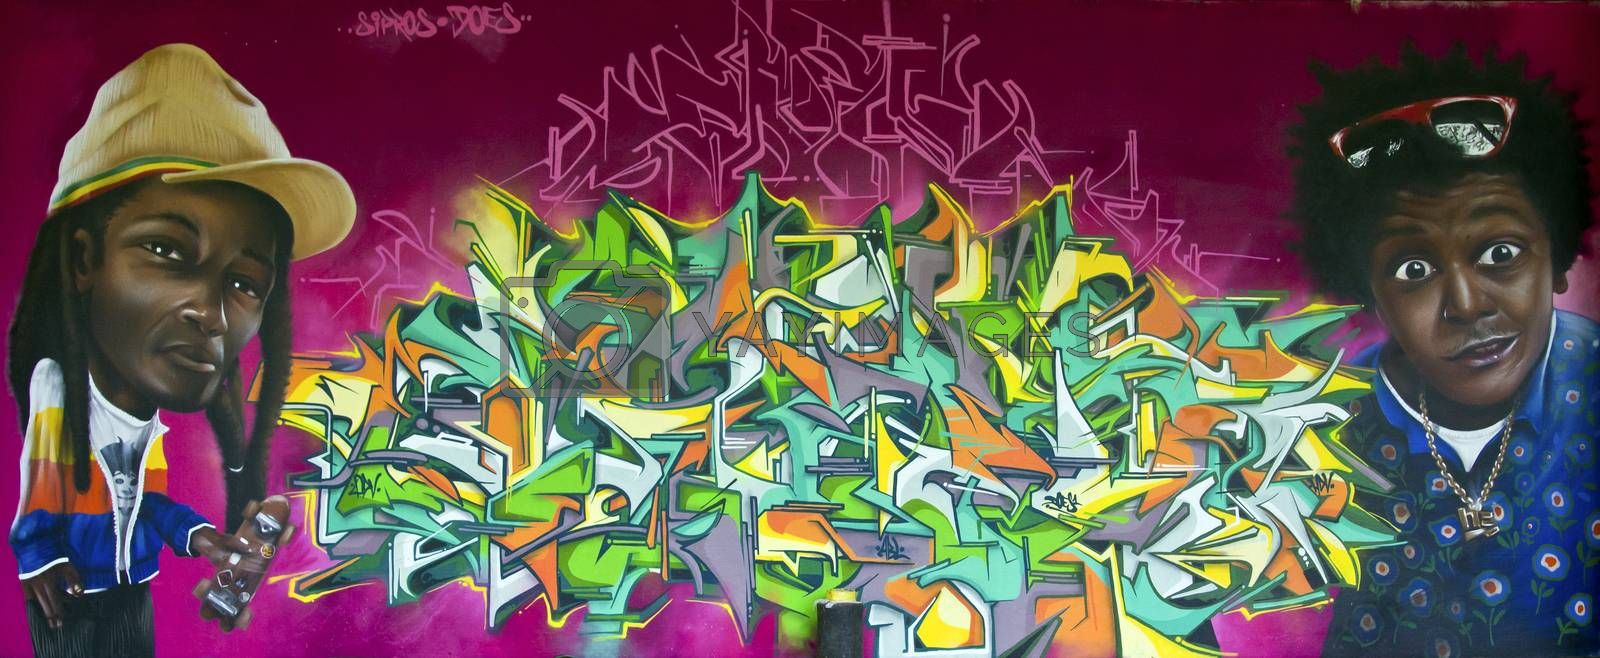 SAO PAULO, BRAZIL - MAY 30, 2015: An mural with graffiti of painter Sipros Naberezny at III Bienal Graffiti Fine Art in Ibirapuera Park, Sao Paulo, Brazil.